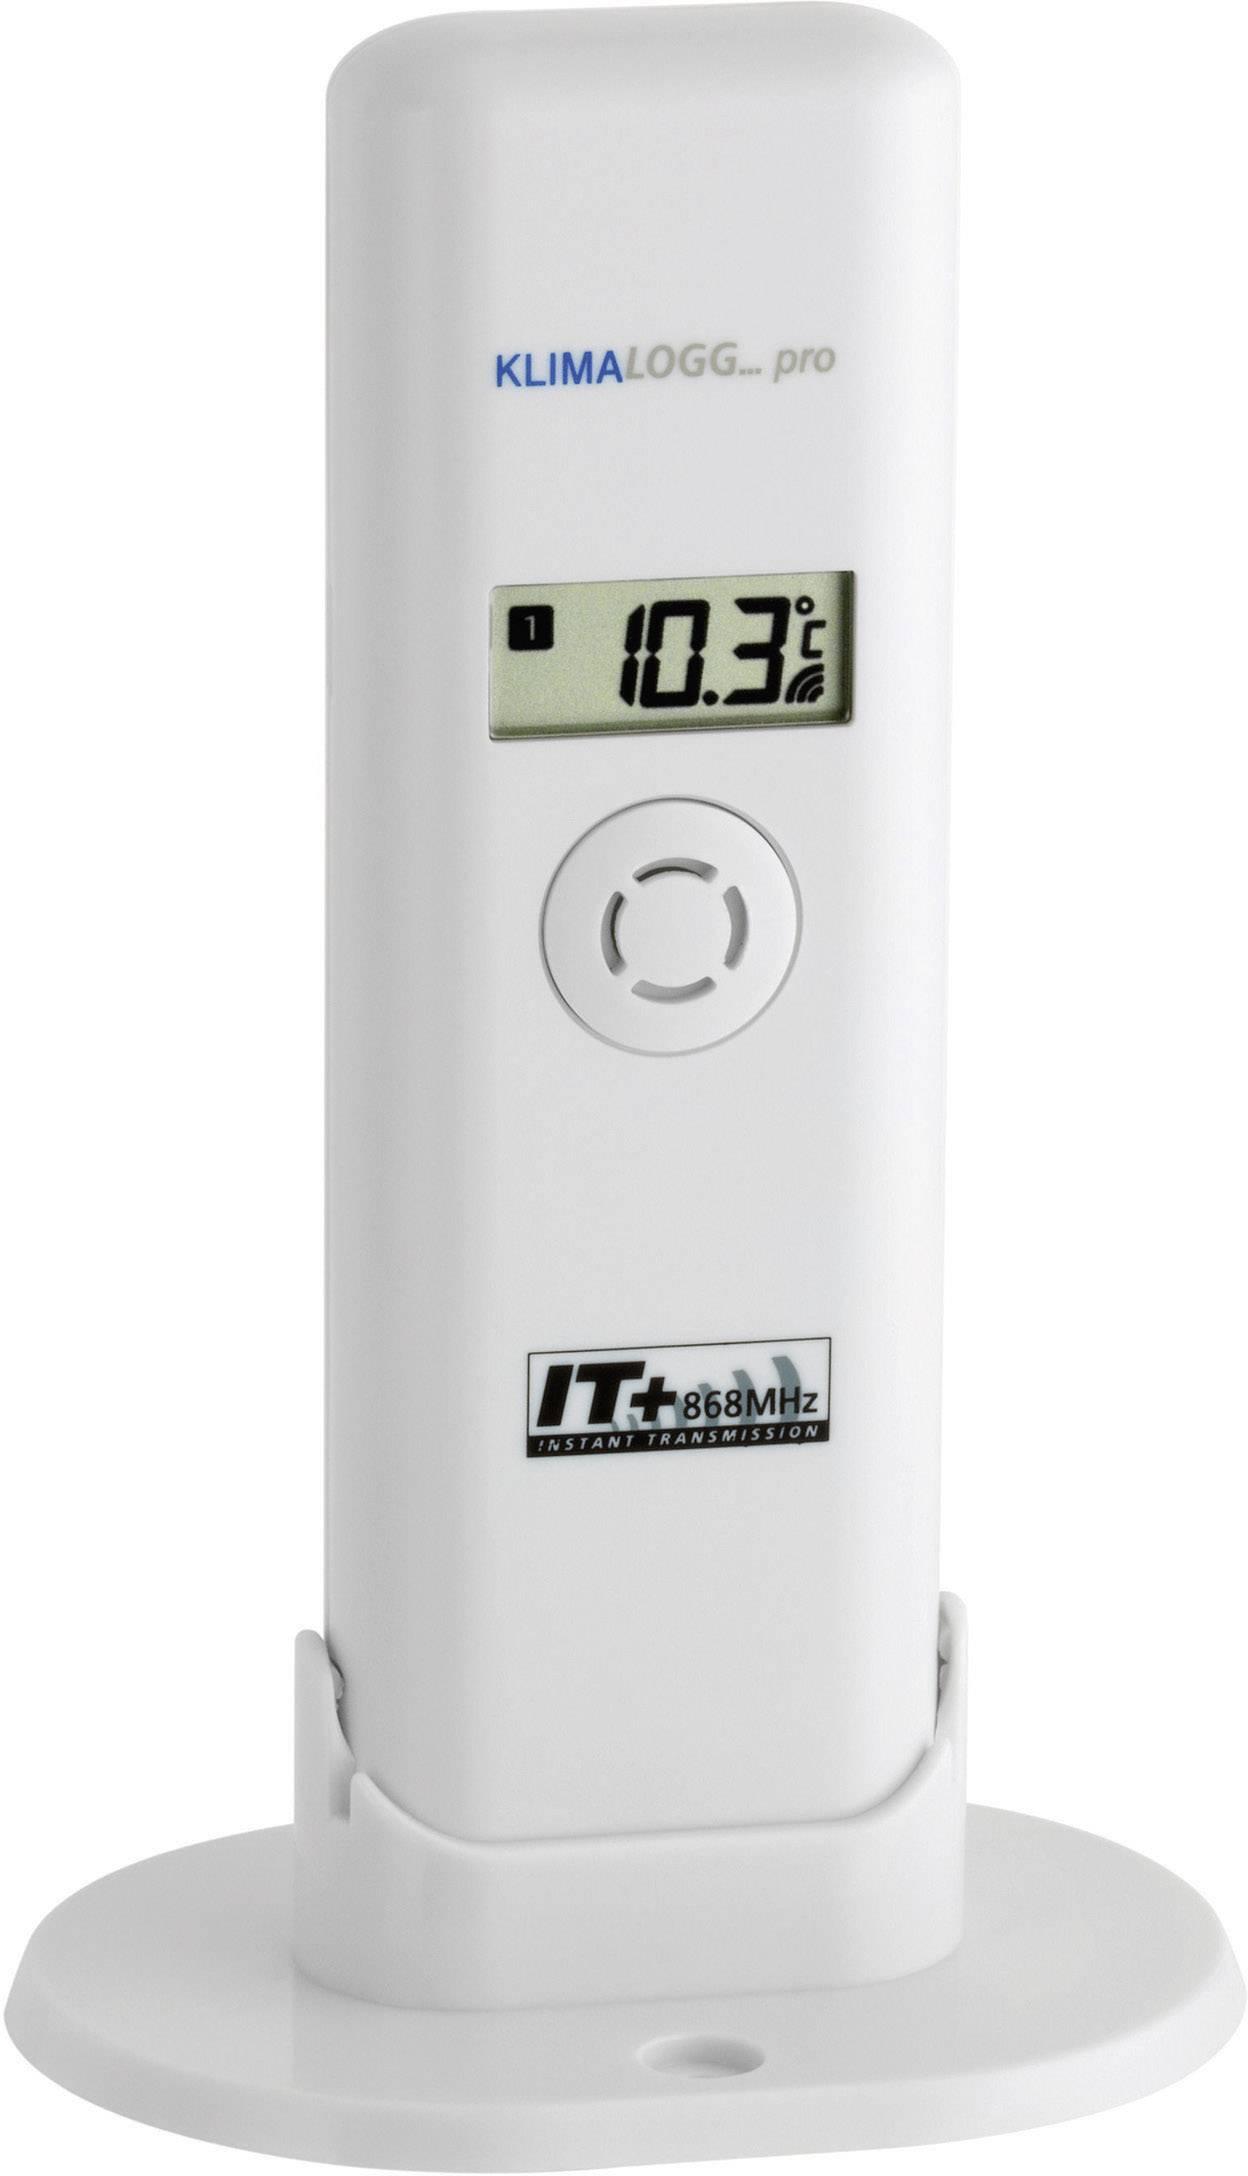 TFA 30.3181.IT Funk-Thermosensor ... 039IT KLIMALOGG Best.Nr. 1240367